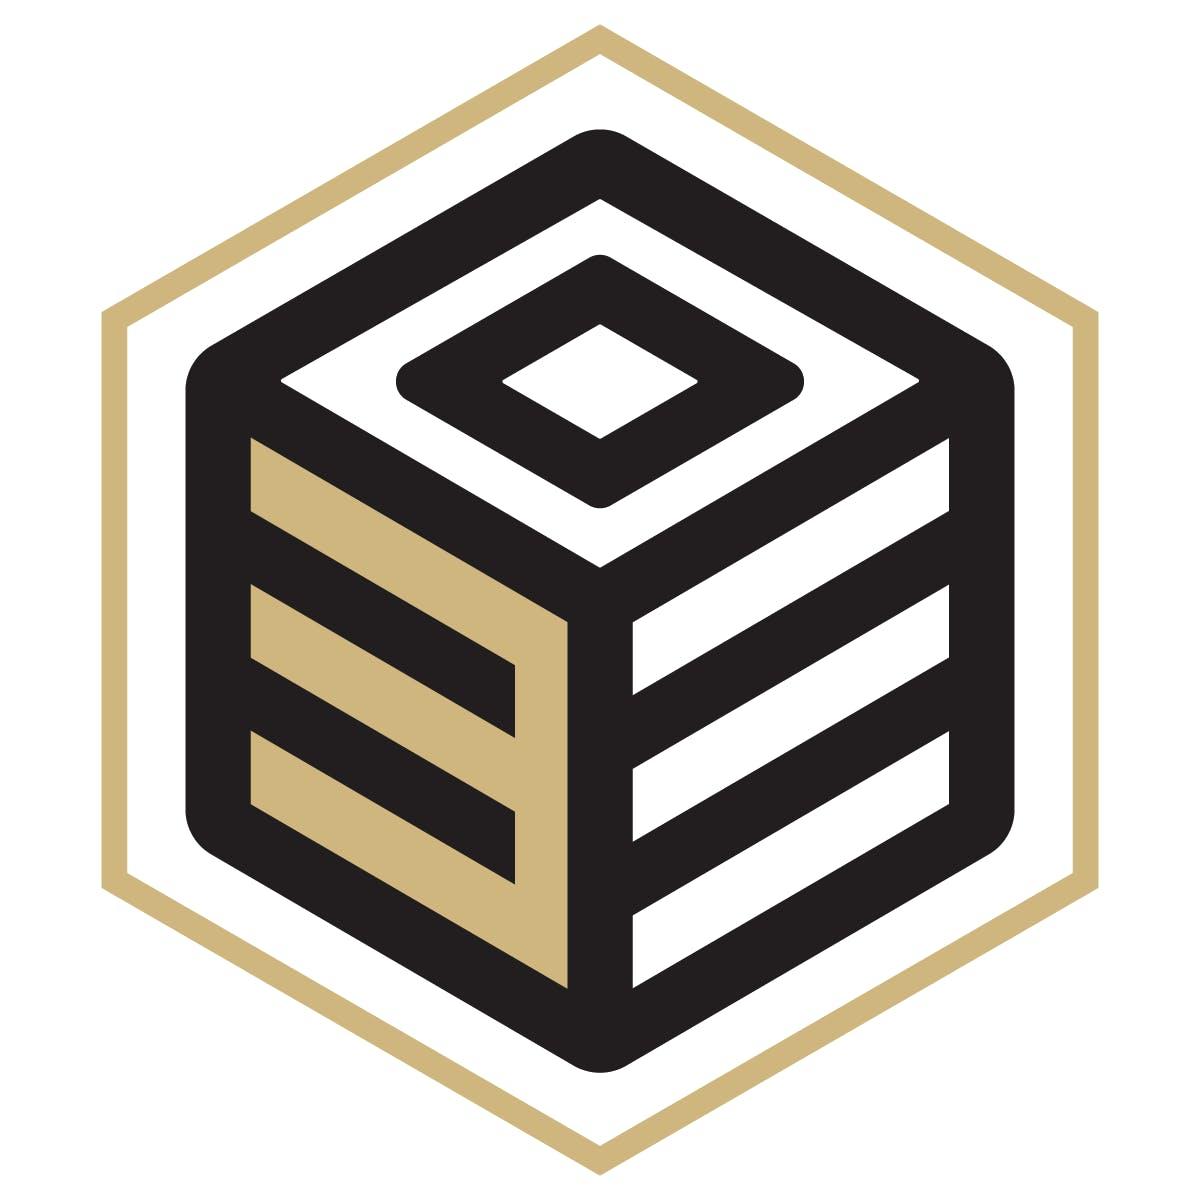 Relational Database Support for Data Warehouses